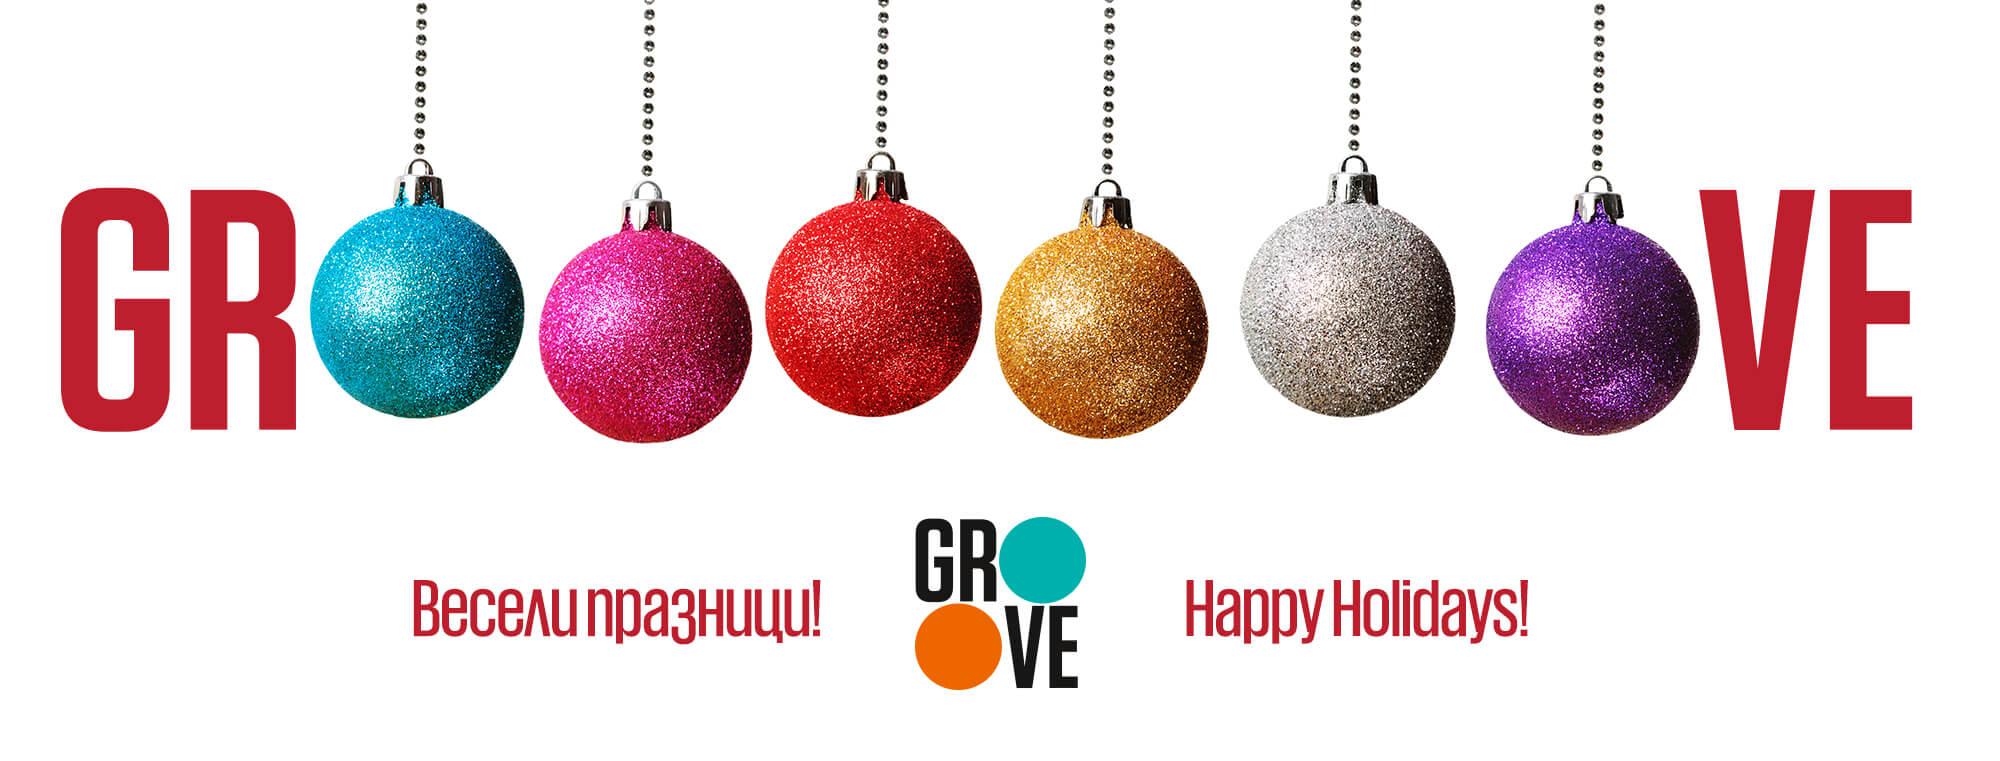 Groove-Happy-Holidays-FB-